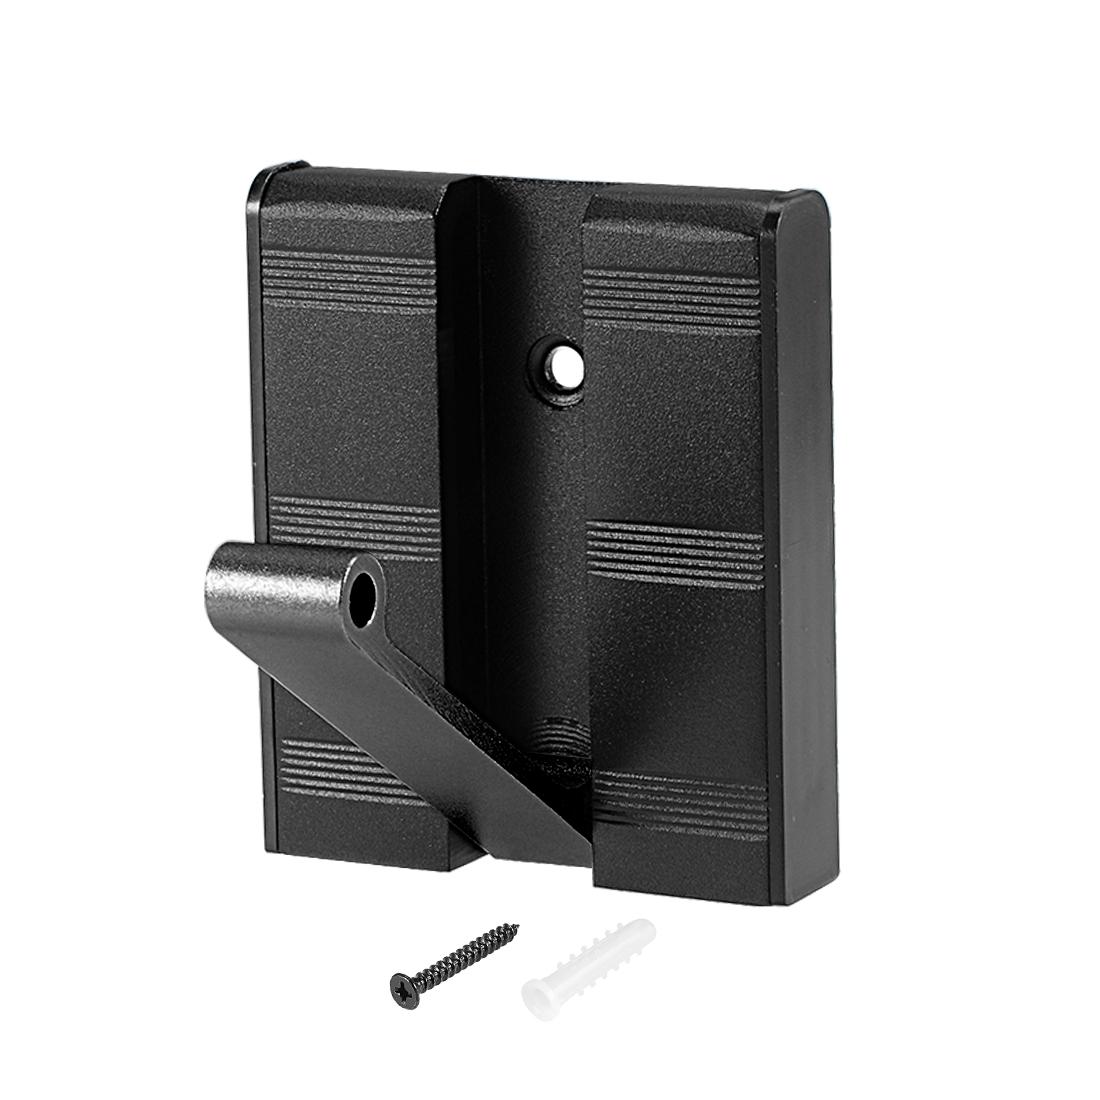 Single Hooks Coat Rack Flip Wall Mount Aluminum Hook 70x60x13mm Black 2Pcs